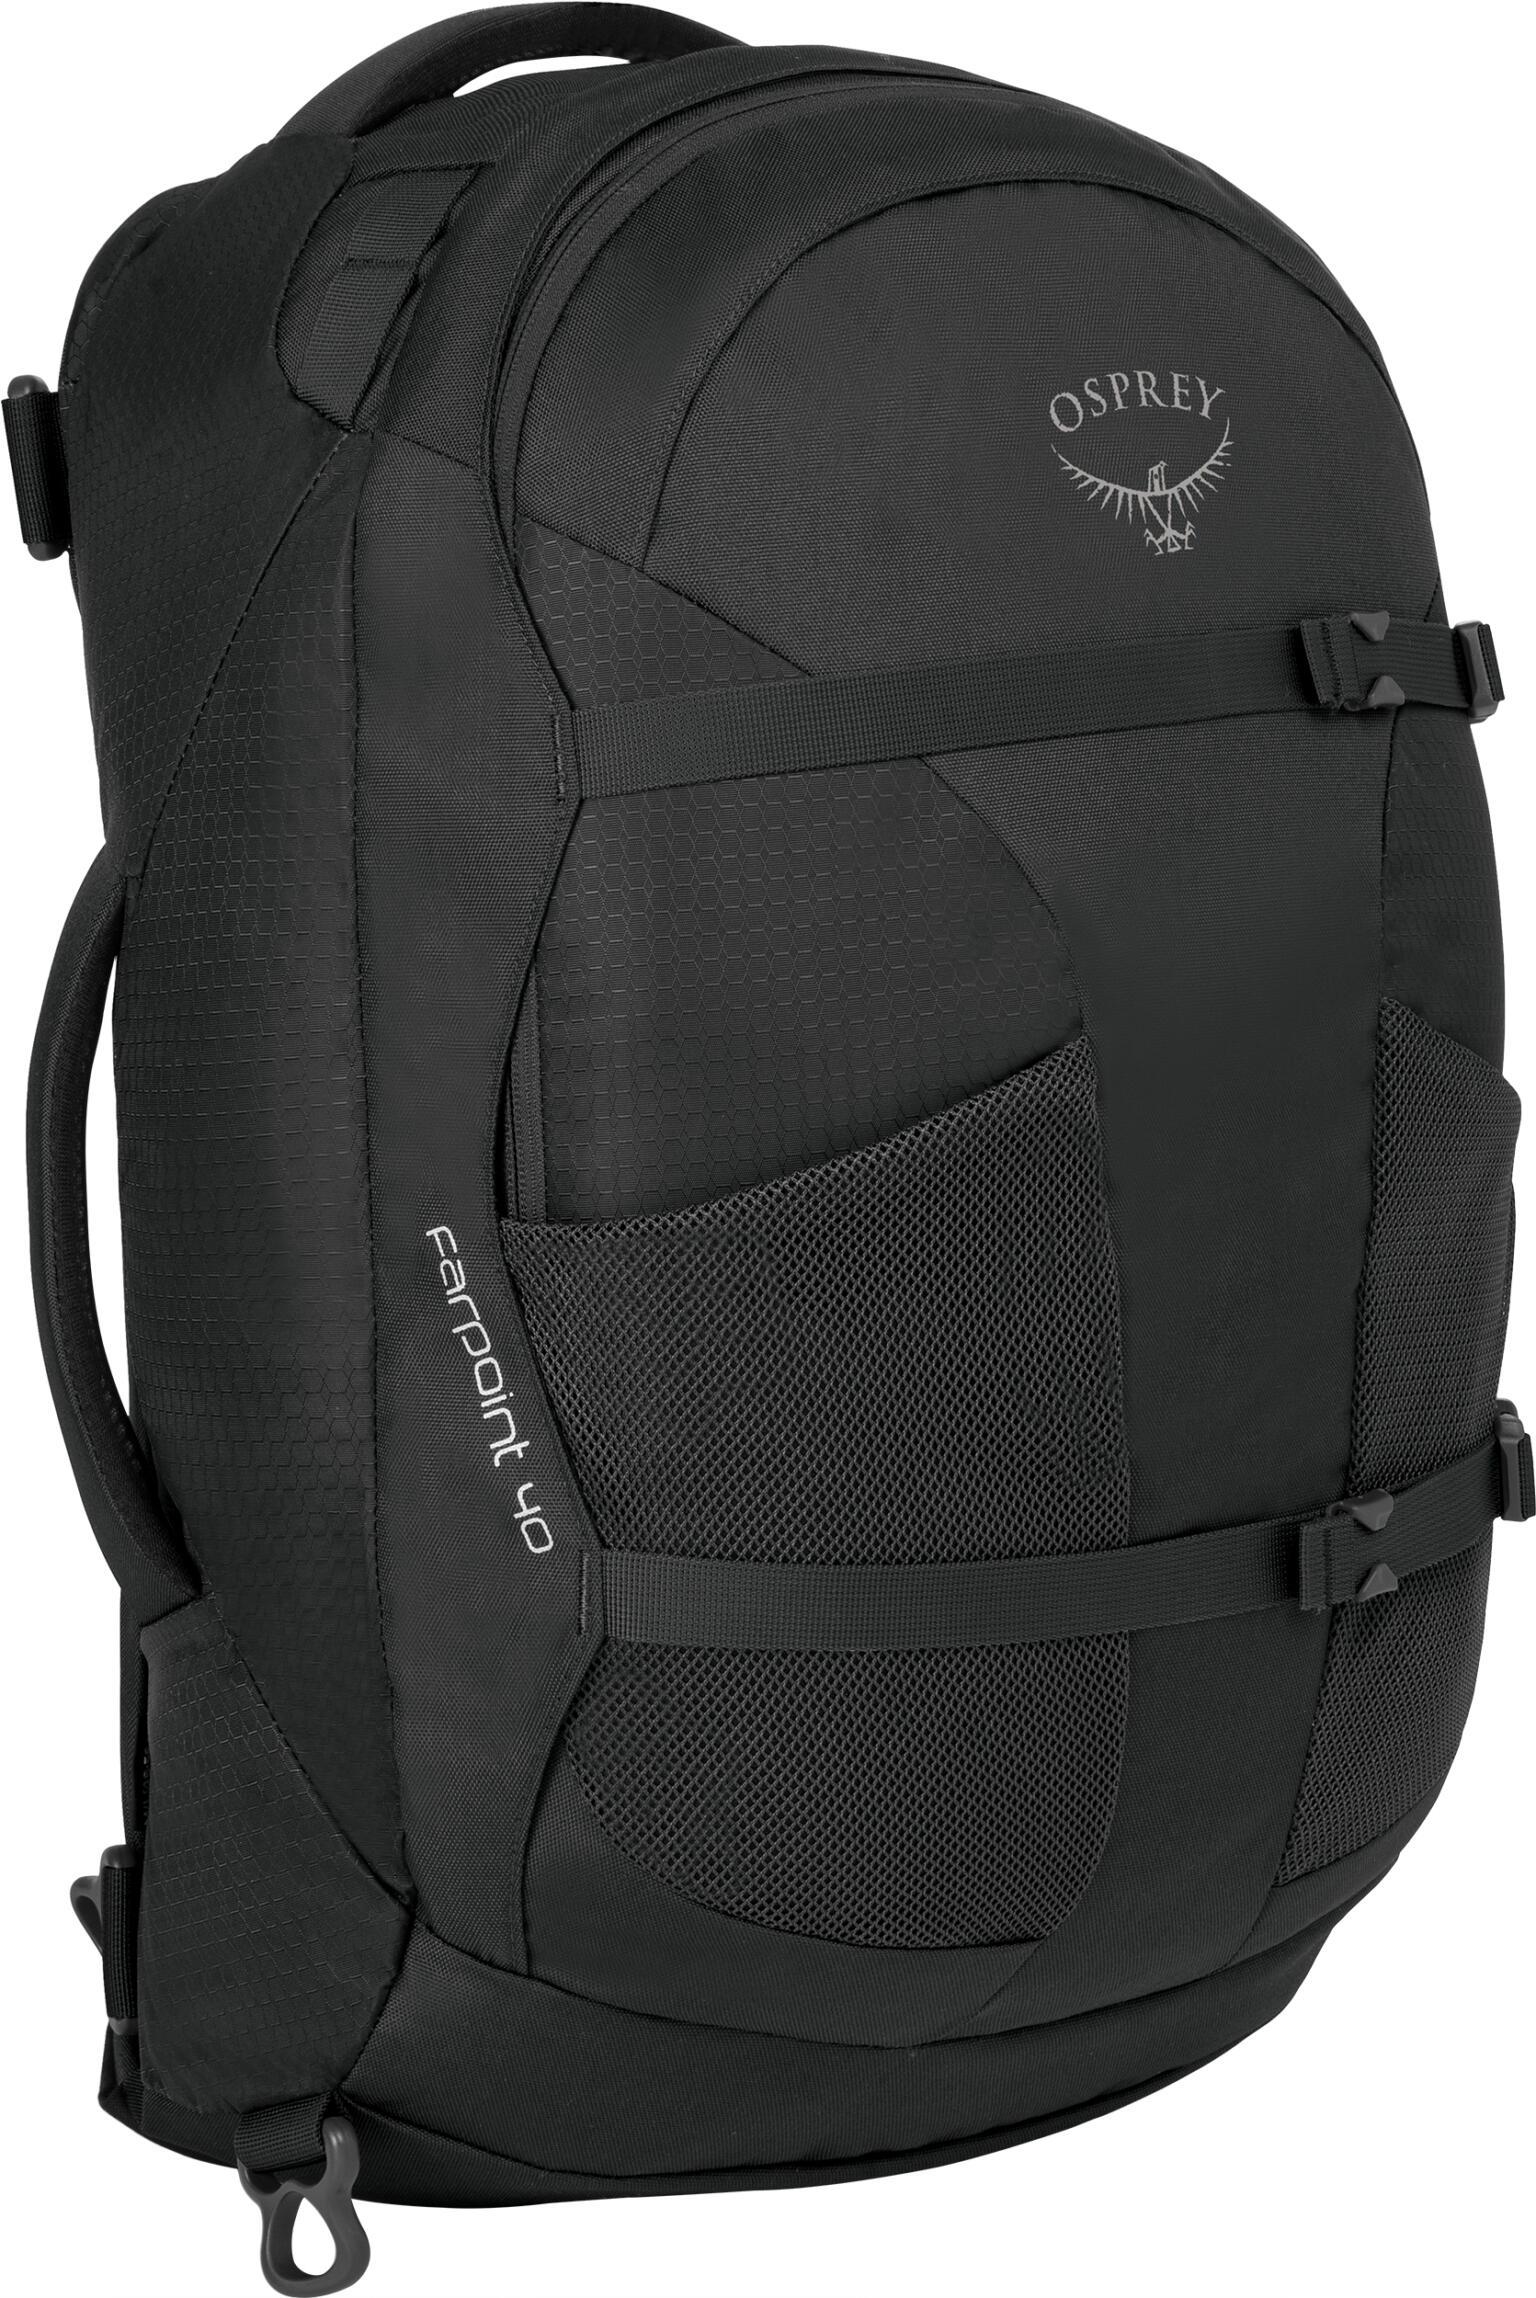 Osprey Farpoint 40 vs Porter 46 review